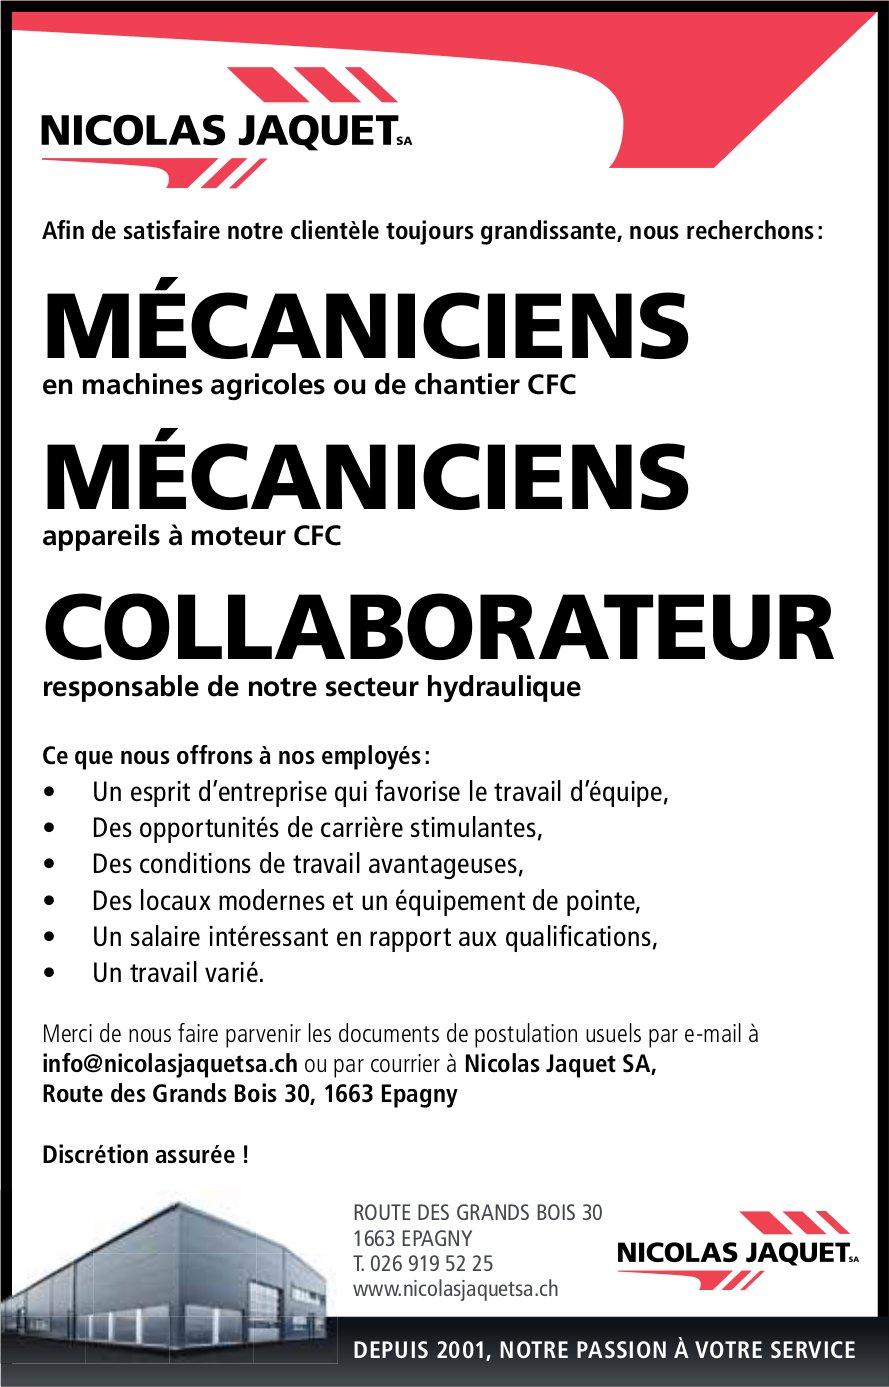 MÉCANICIENS, NICOLAS JAQUET SA, Epagny, recheché